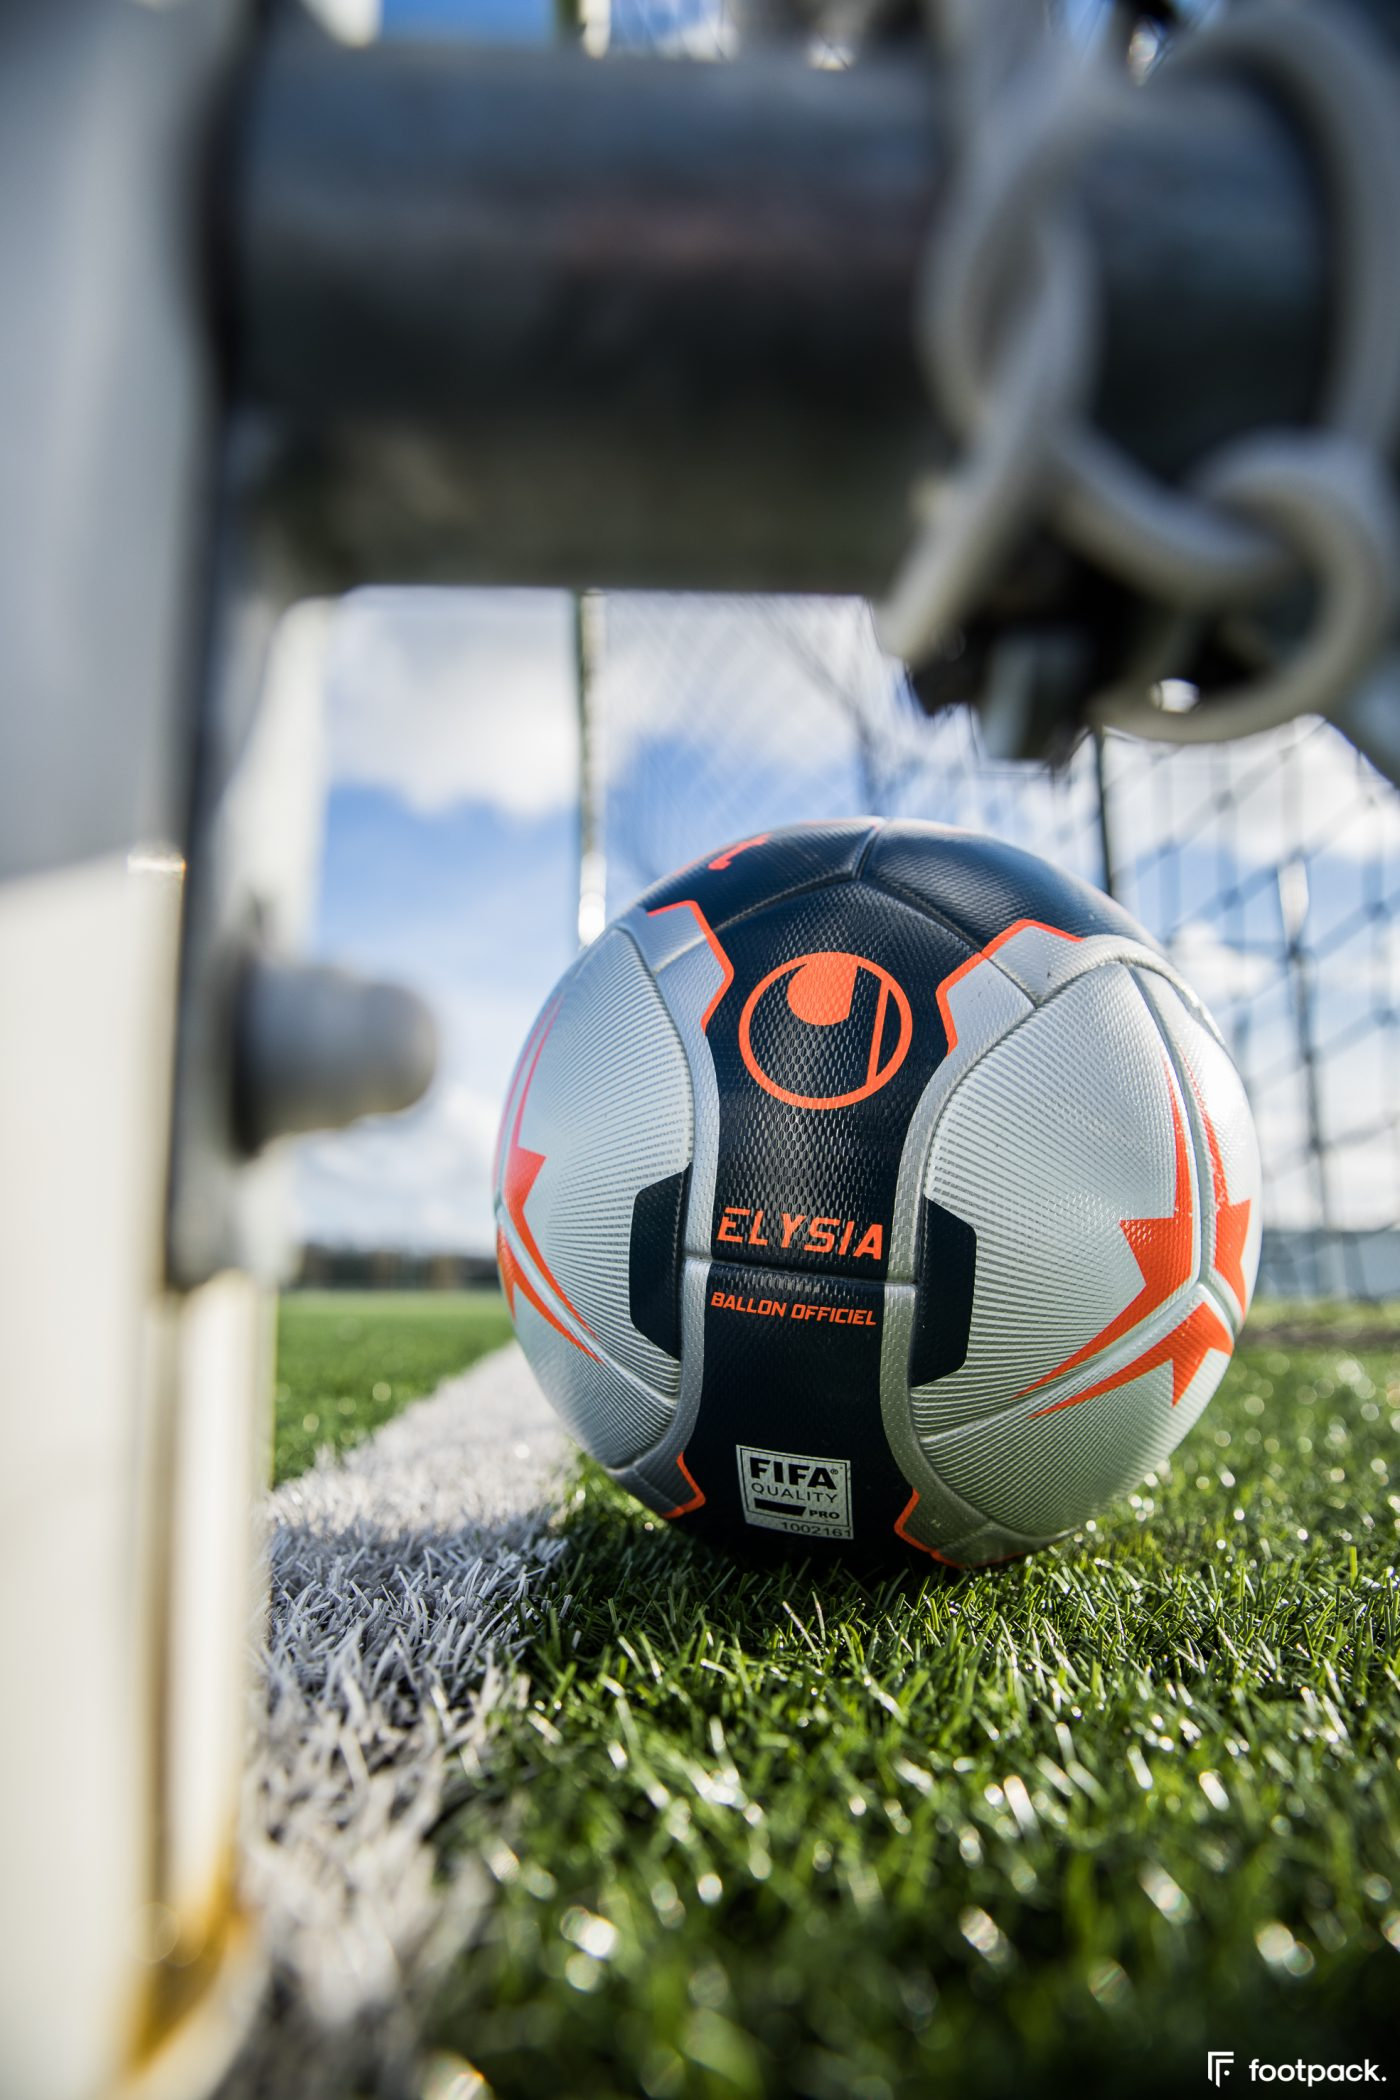 ballon-uhlsport-ligue-1-2020-2021-footpack-3